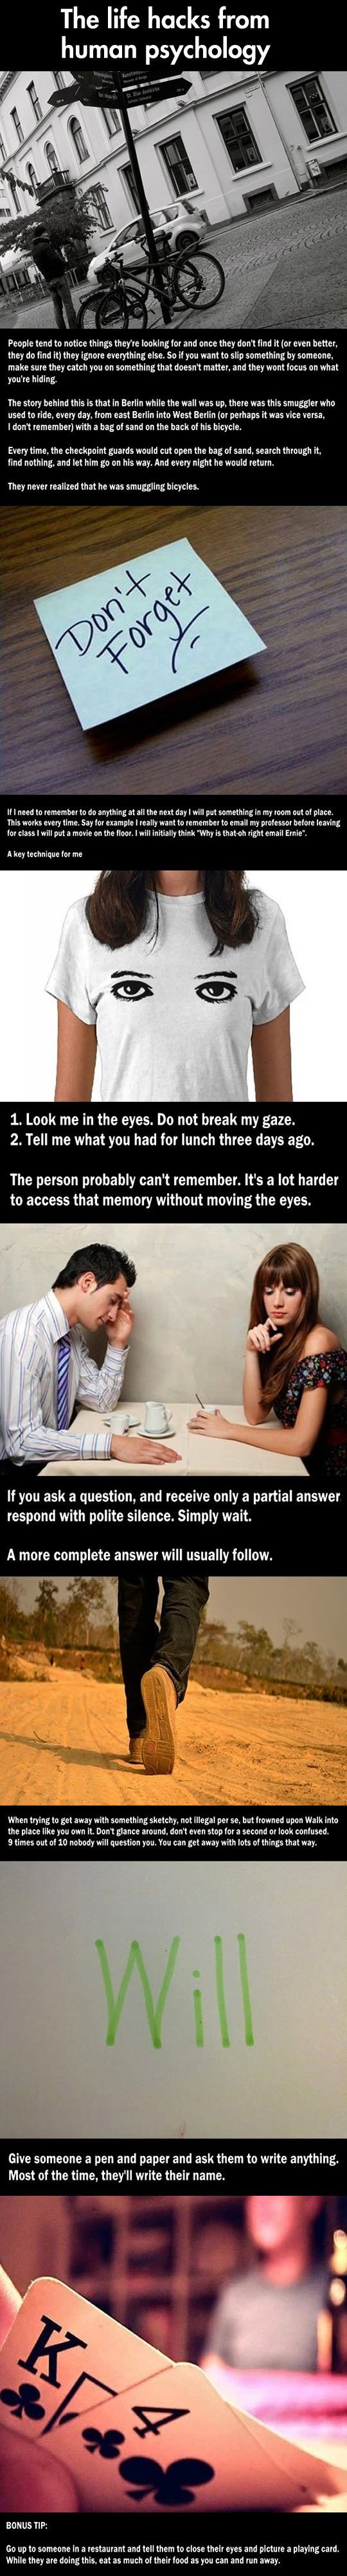 Cool life hacks: Human psychology version...